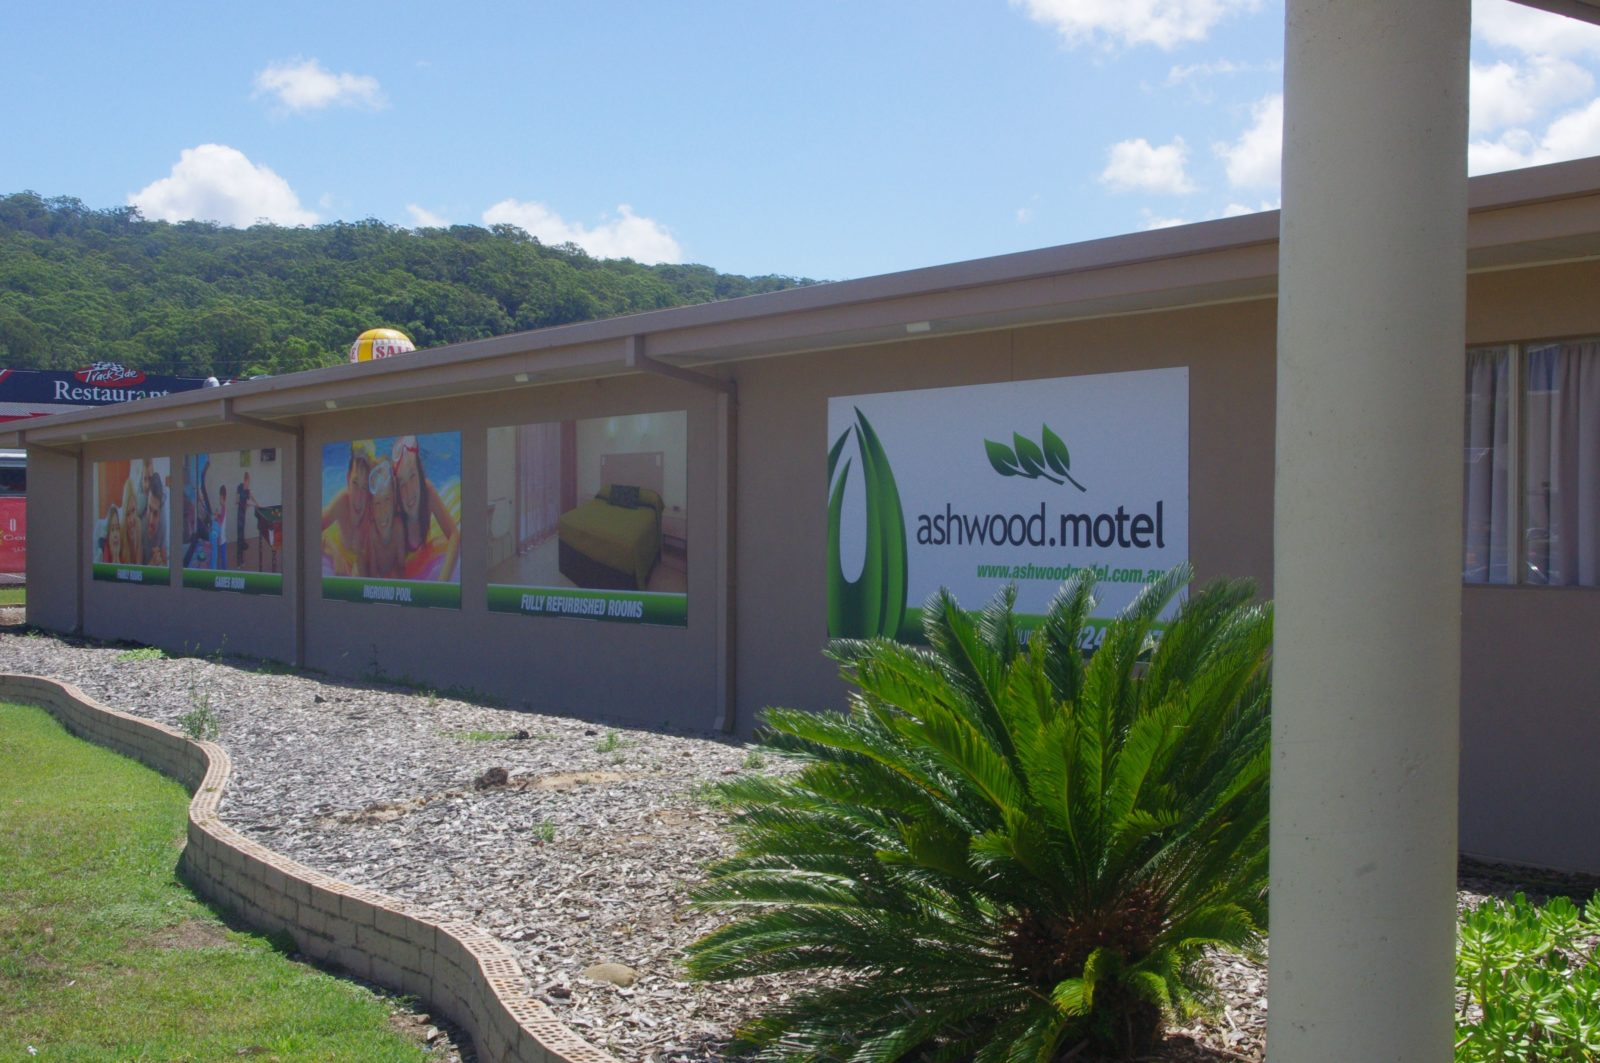 Ashwood Motel